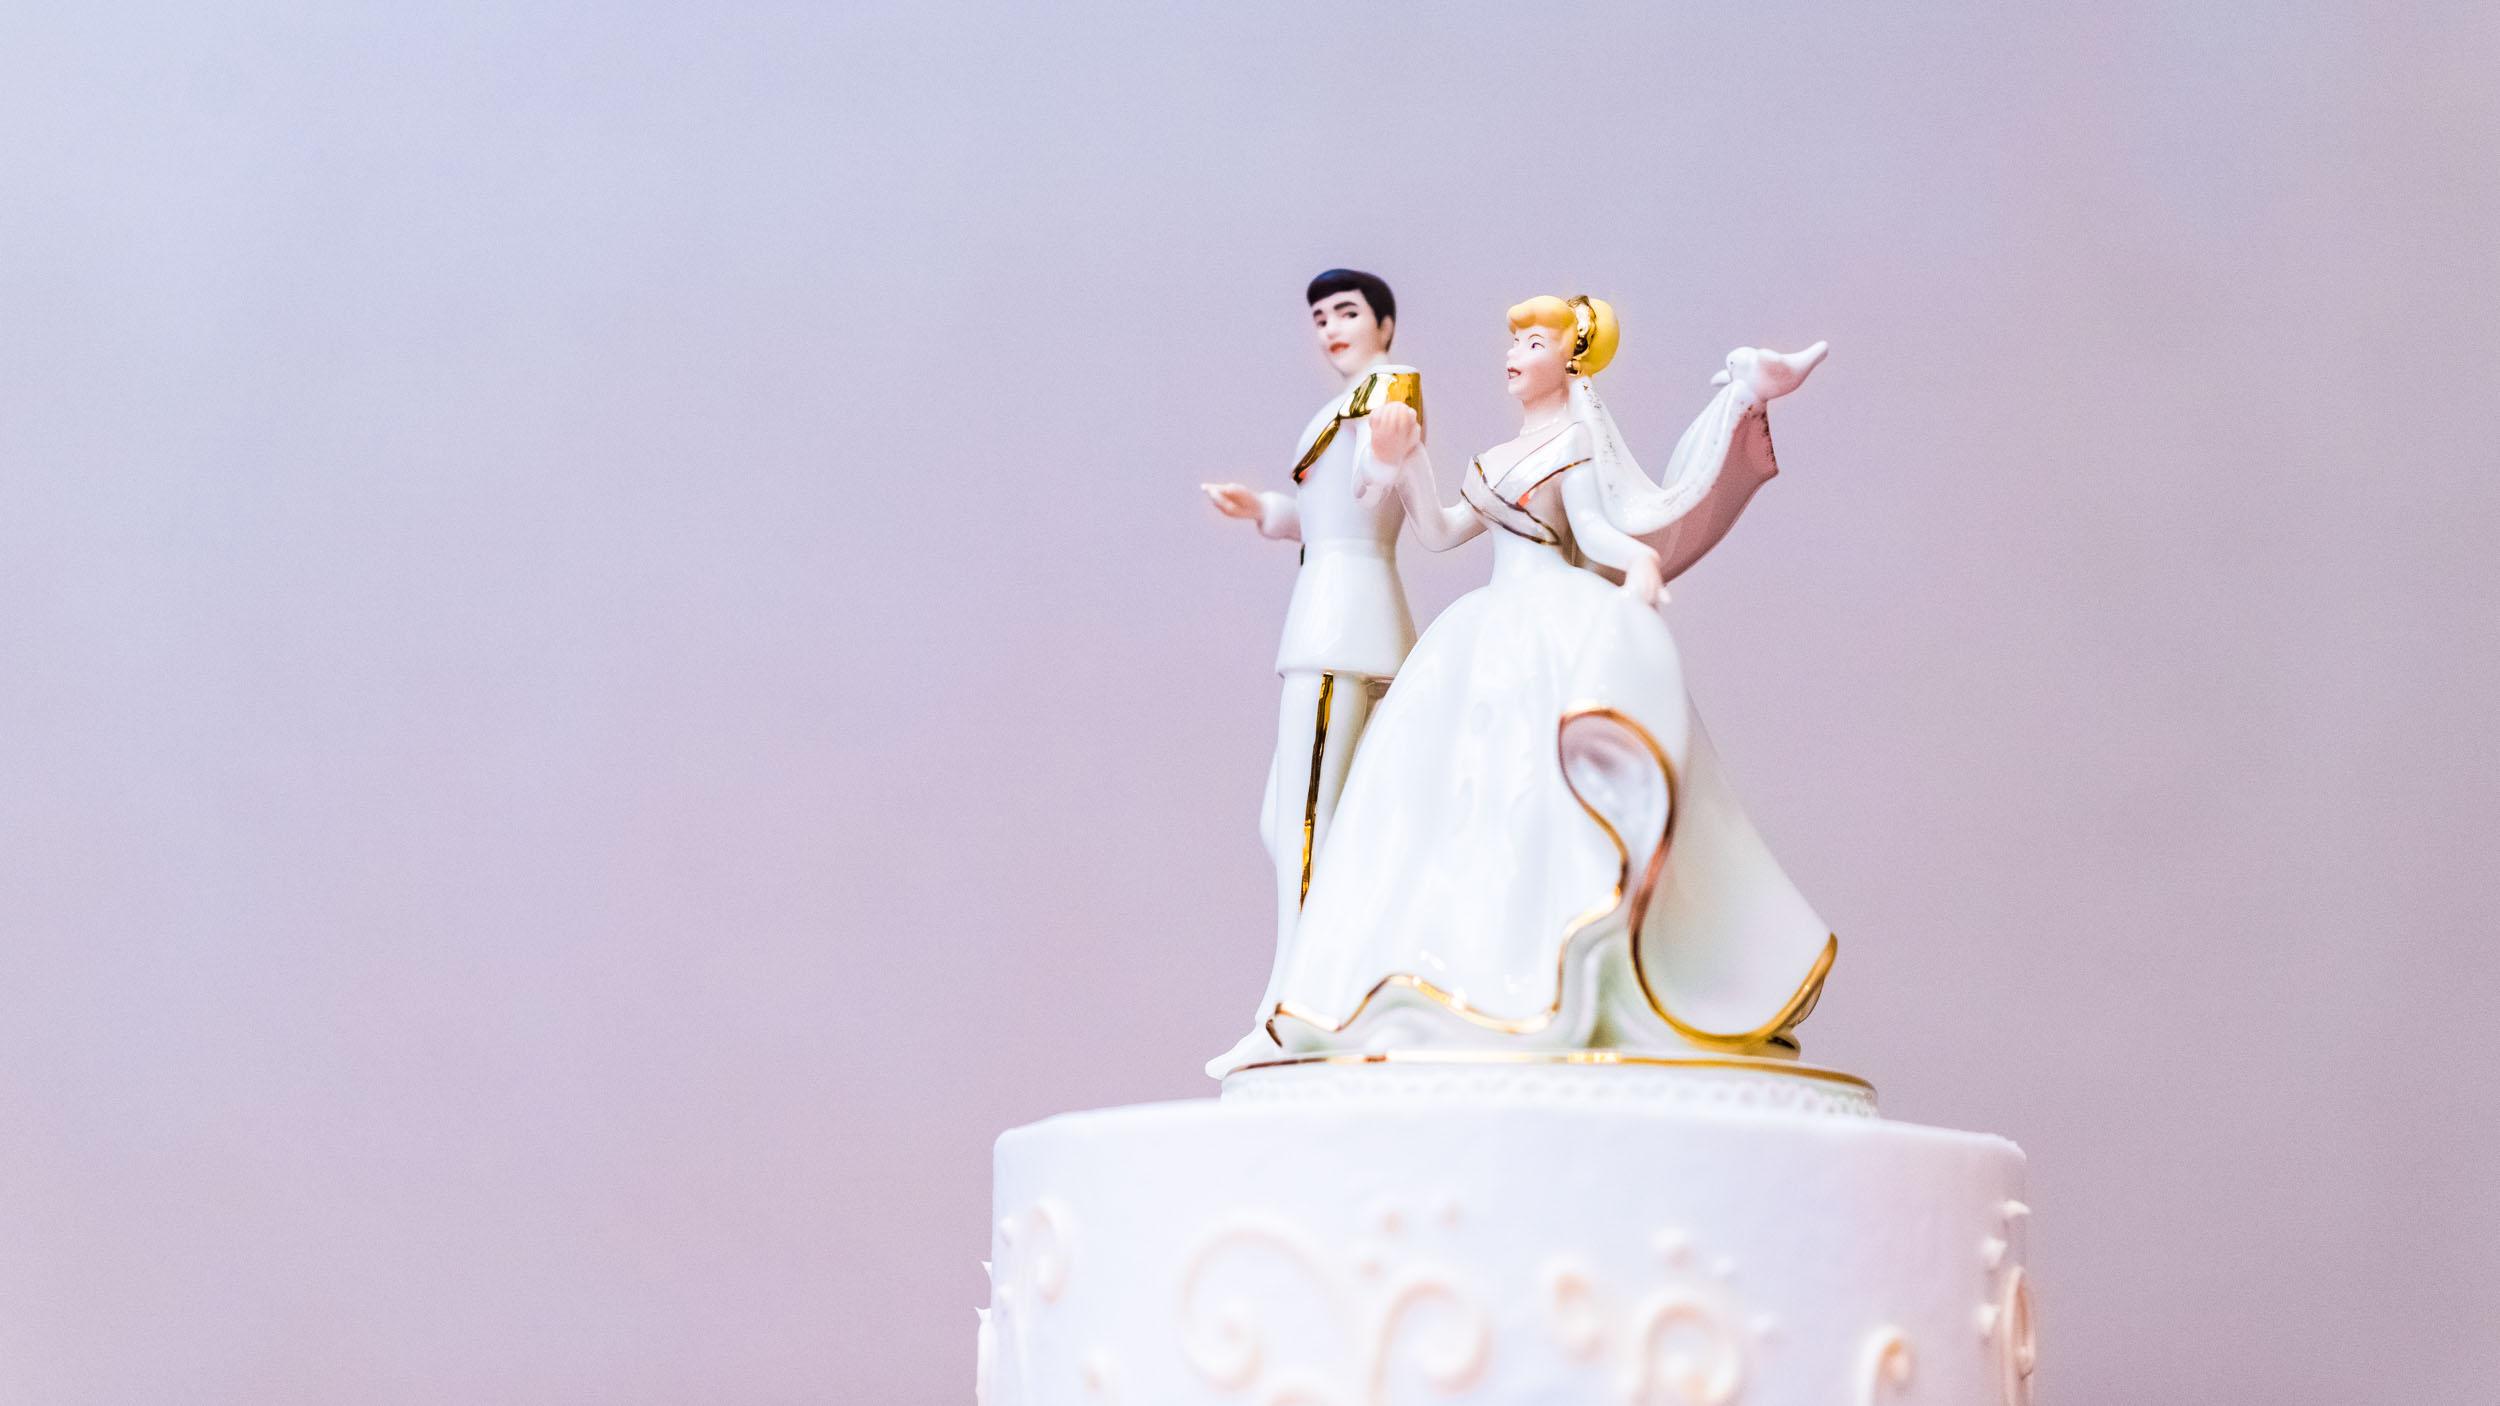 dc+metro+wedding+photographer+vadym+guliuk+photography+wedding+cake-2021.jpg